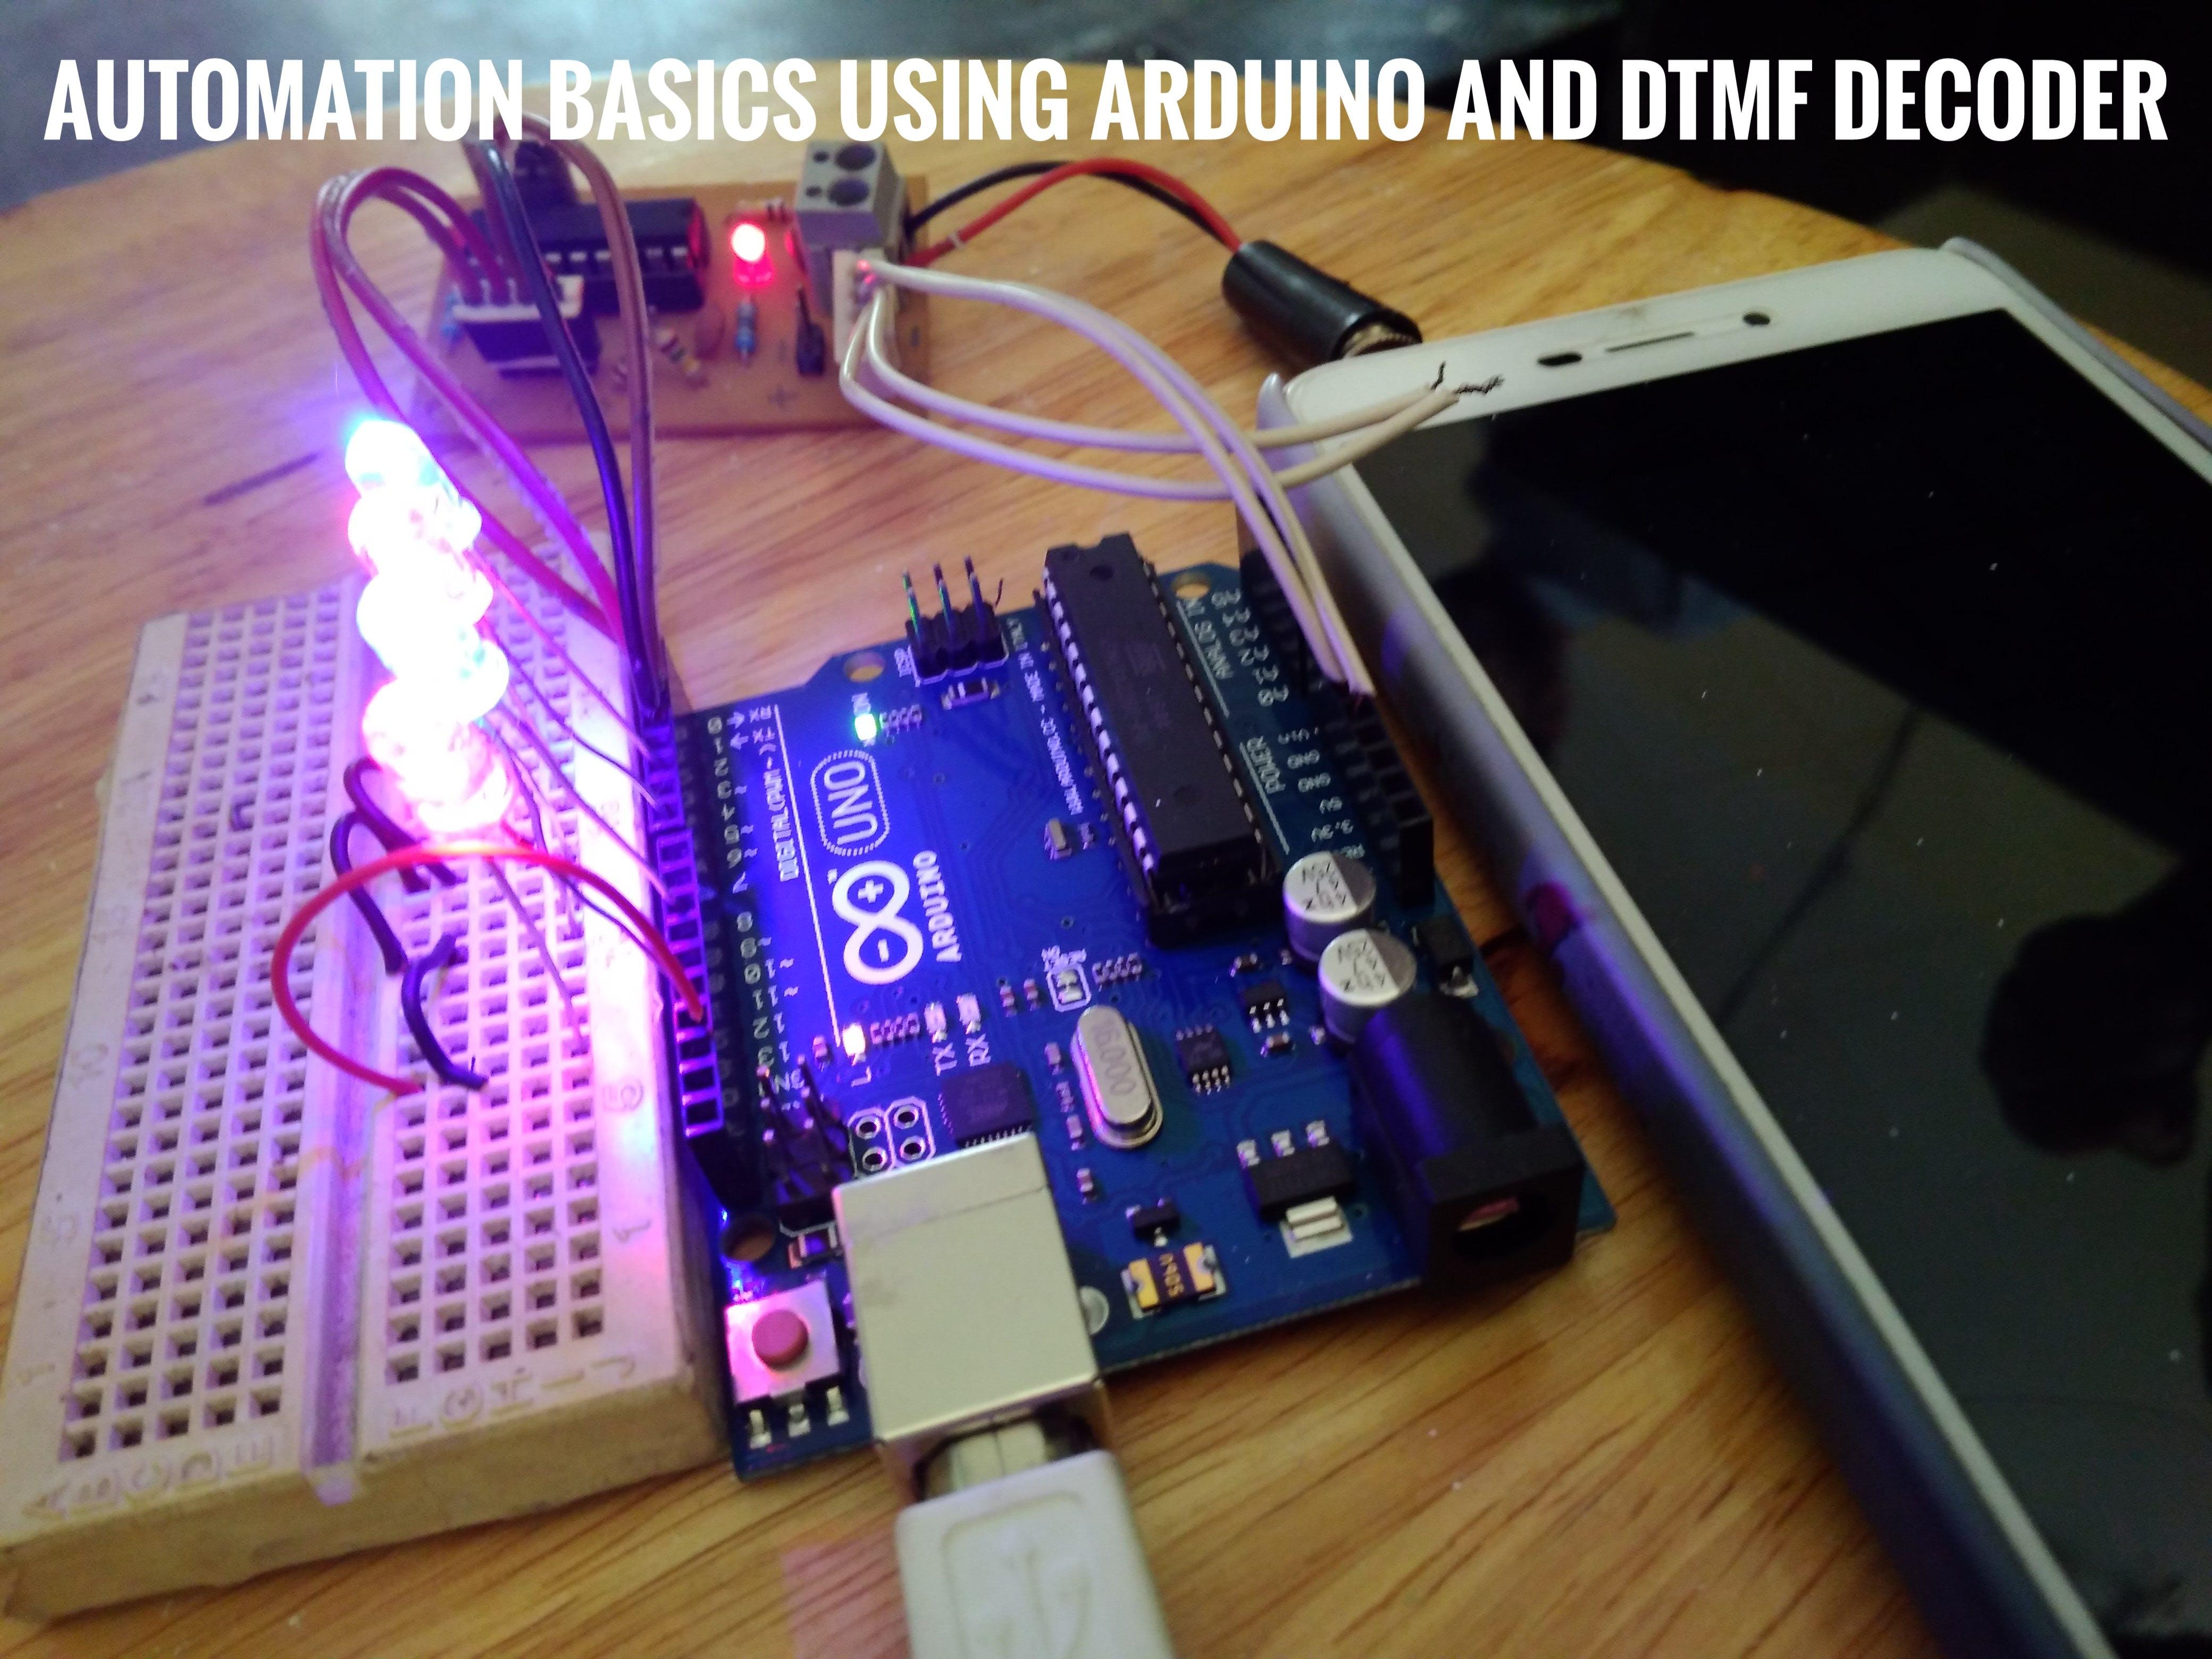 Automation basics using arduino and DTMF decoder